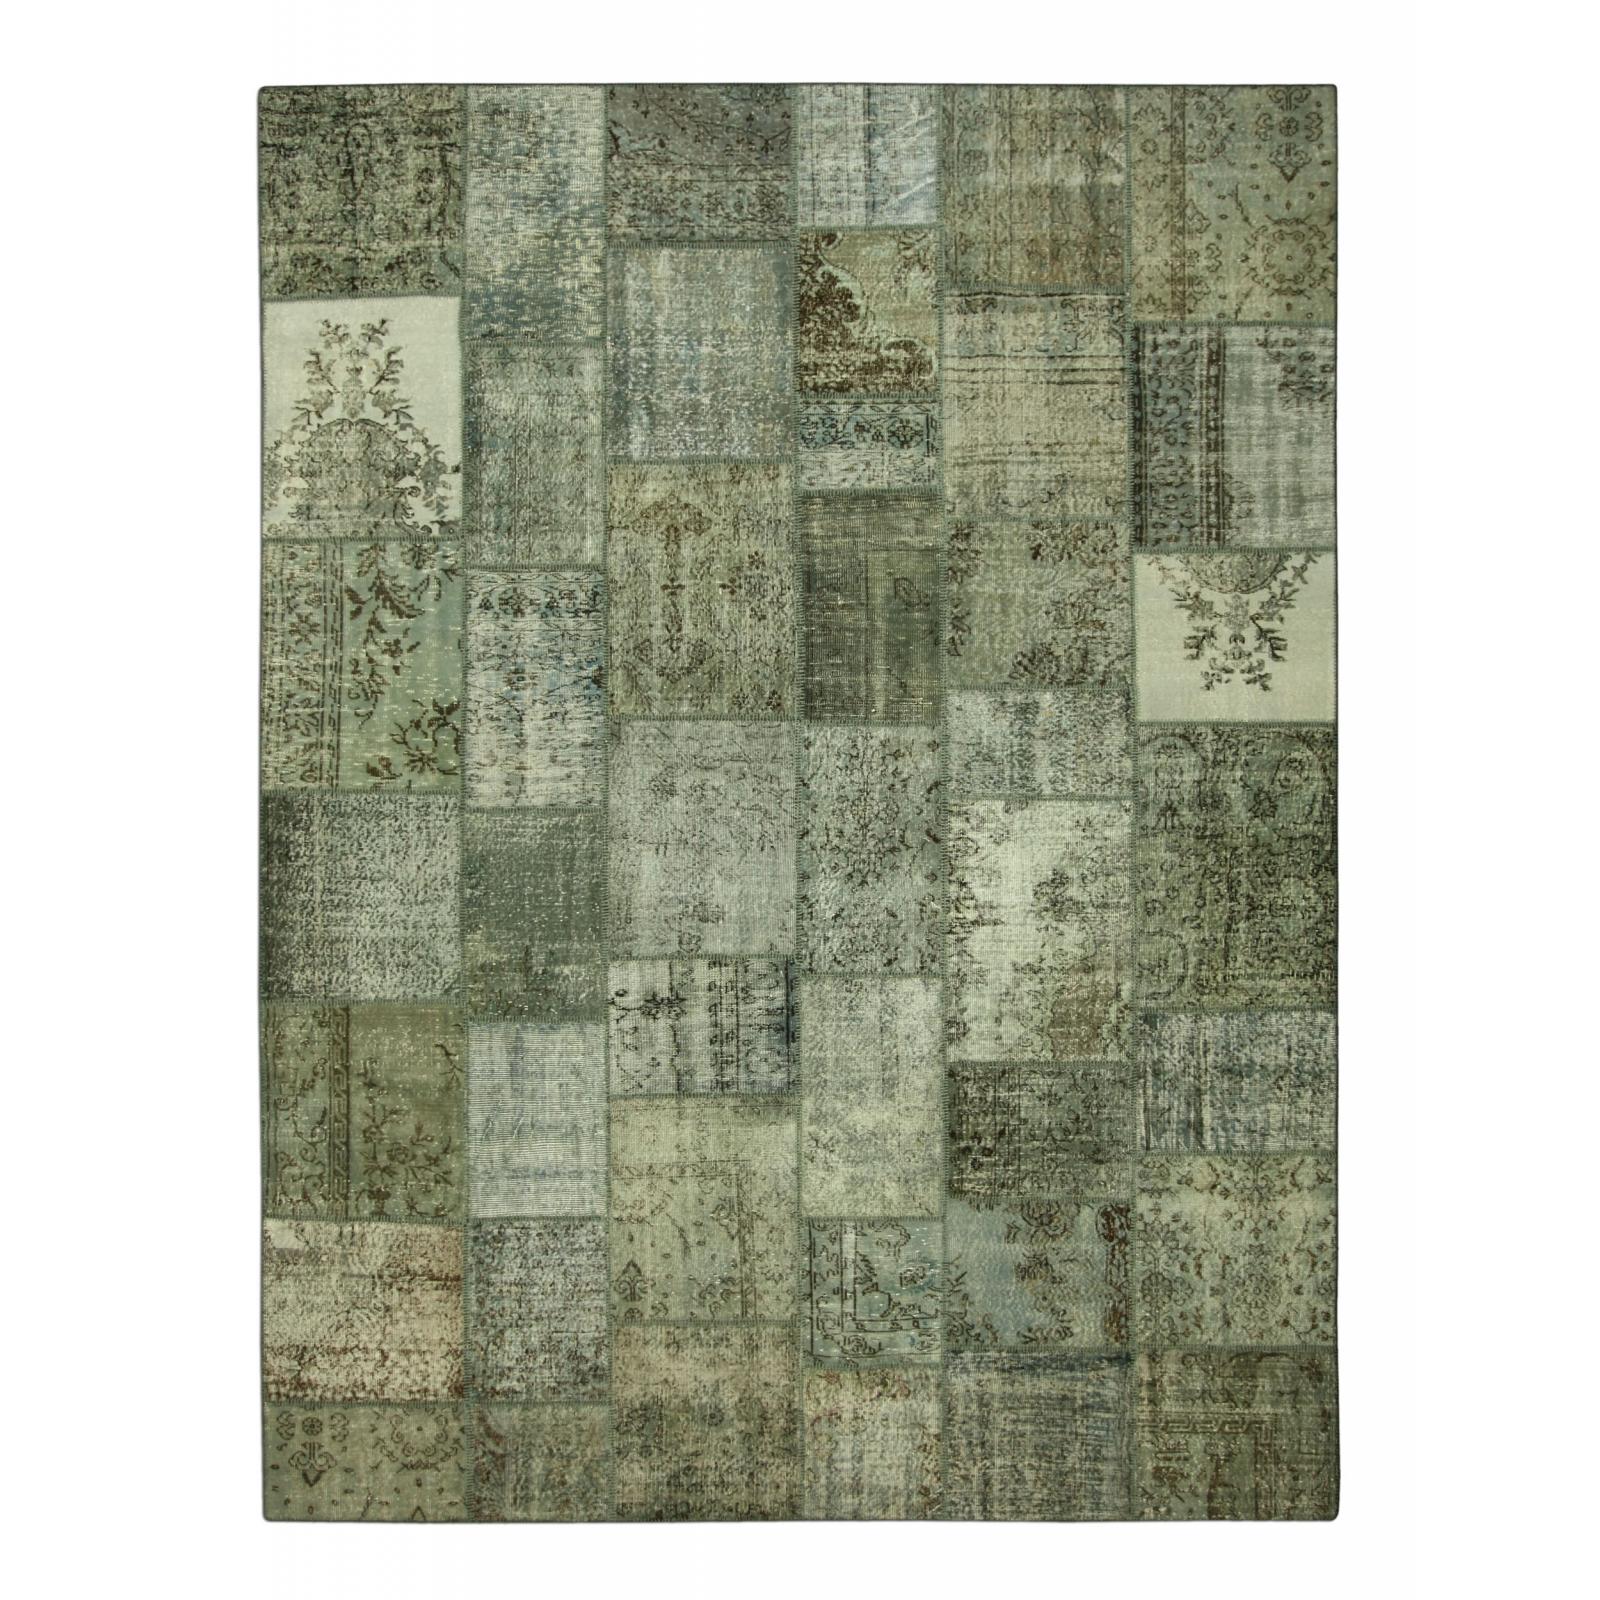 gris vintage tapis de patchwork 405x305cm. Black Bedroom Furniture Sets. Home Design Ideas